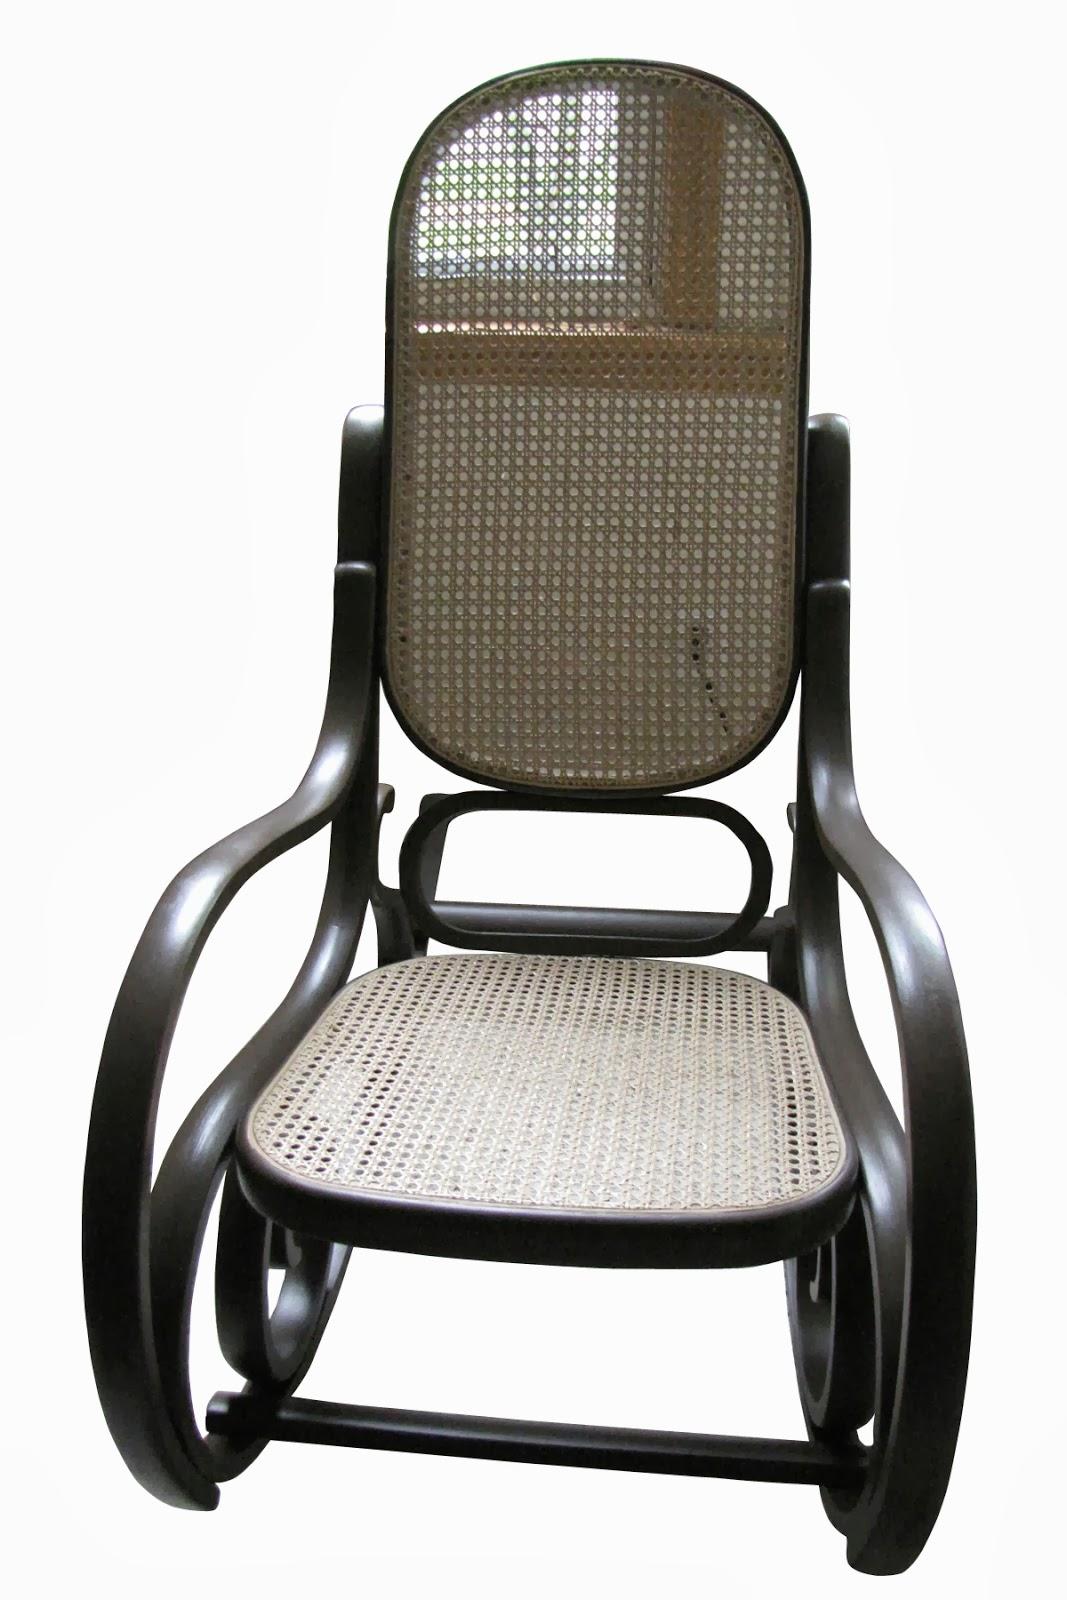 Prime Finale Furniture Restoration Services Llc The Bentwood Rocker Machost Co Dining Chair Design Ideas Machostcouk